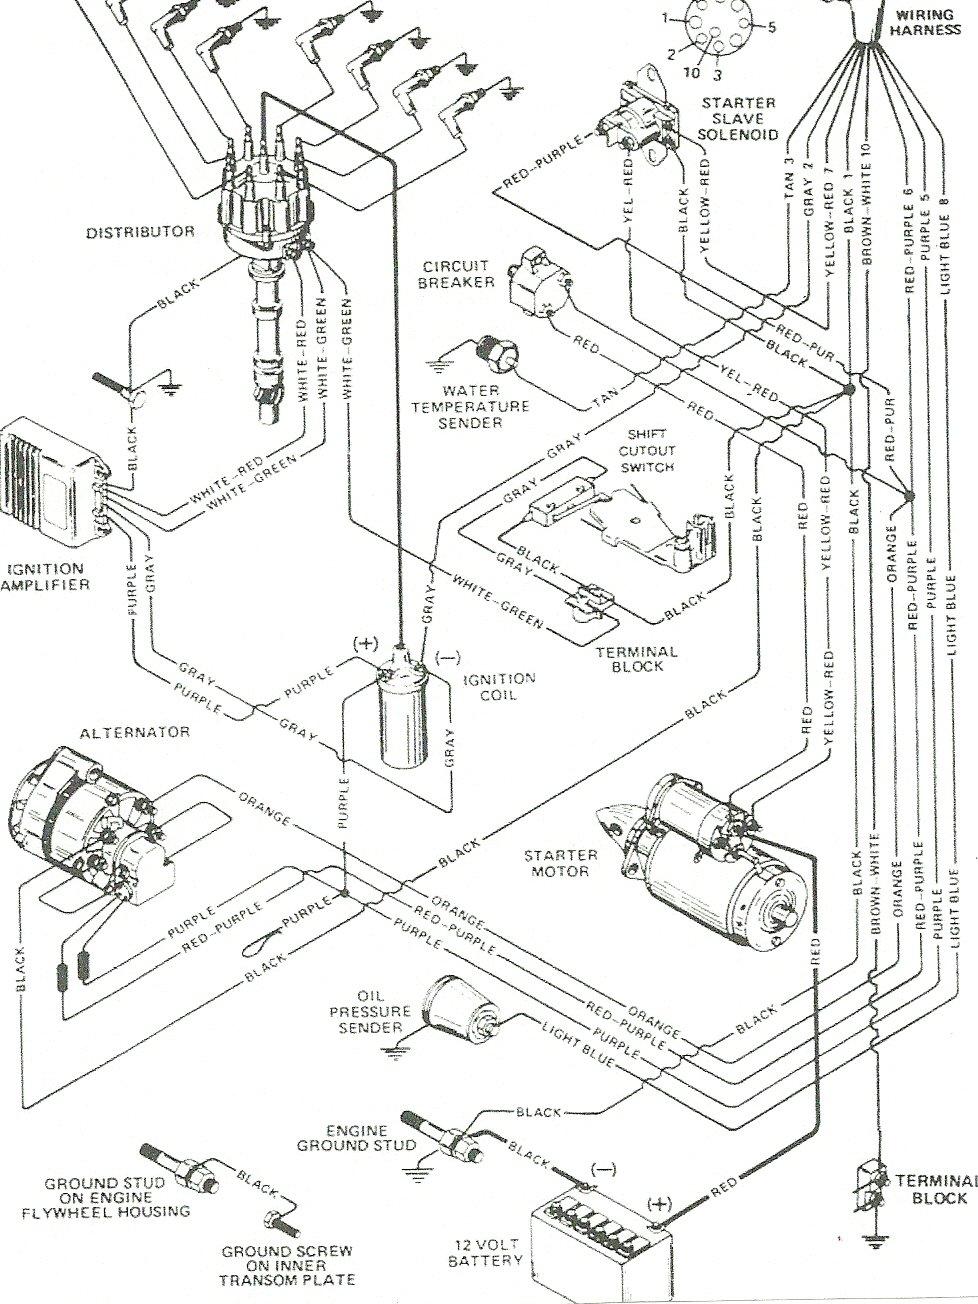 mercruiser 250ci ignition wiring diagram. Black Bedroom Furniture Sets. Home Design Ideas